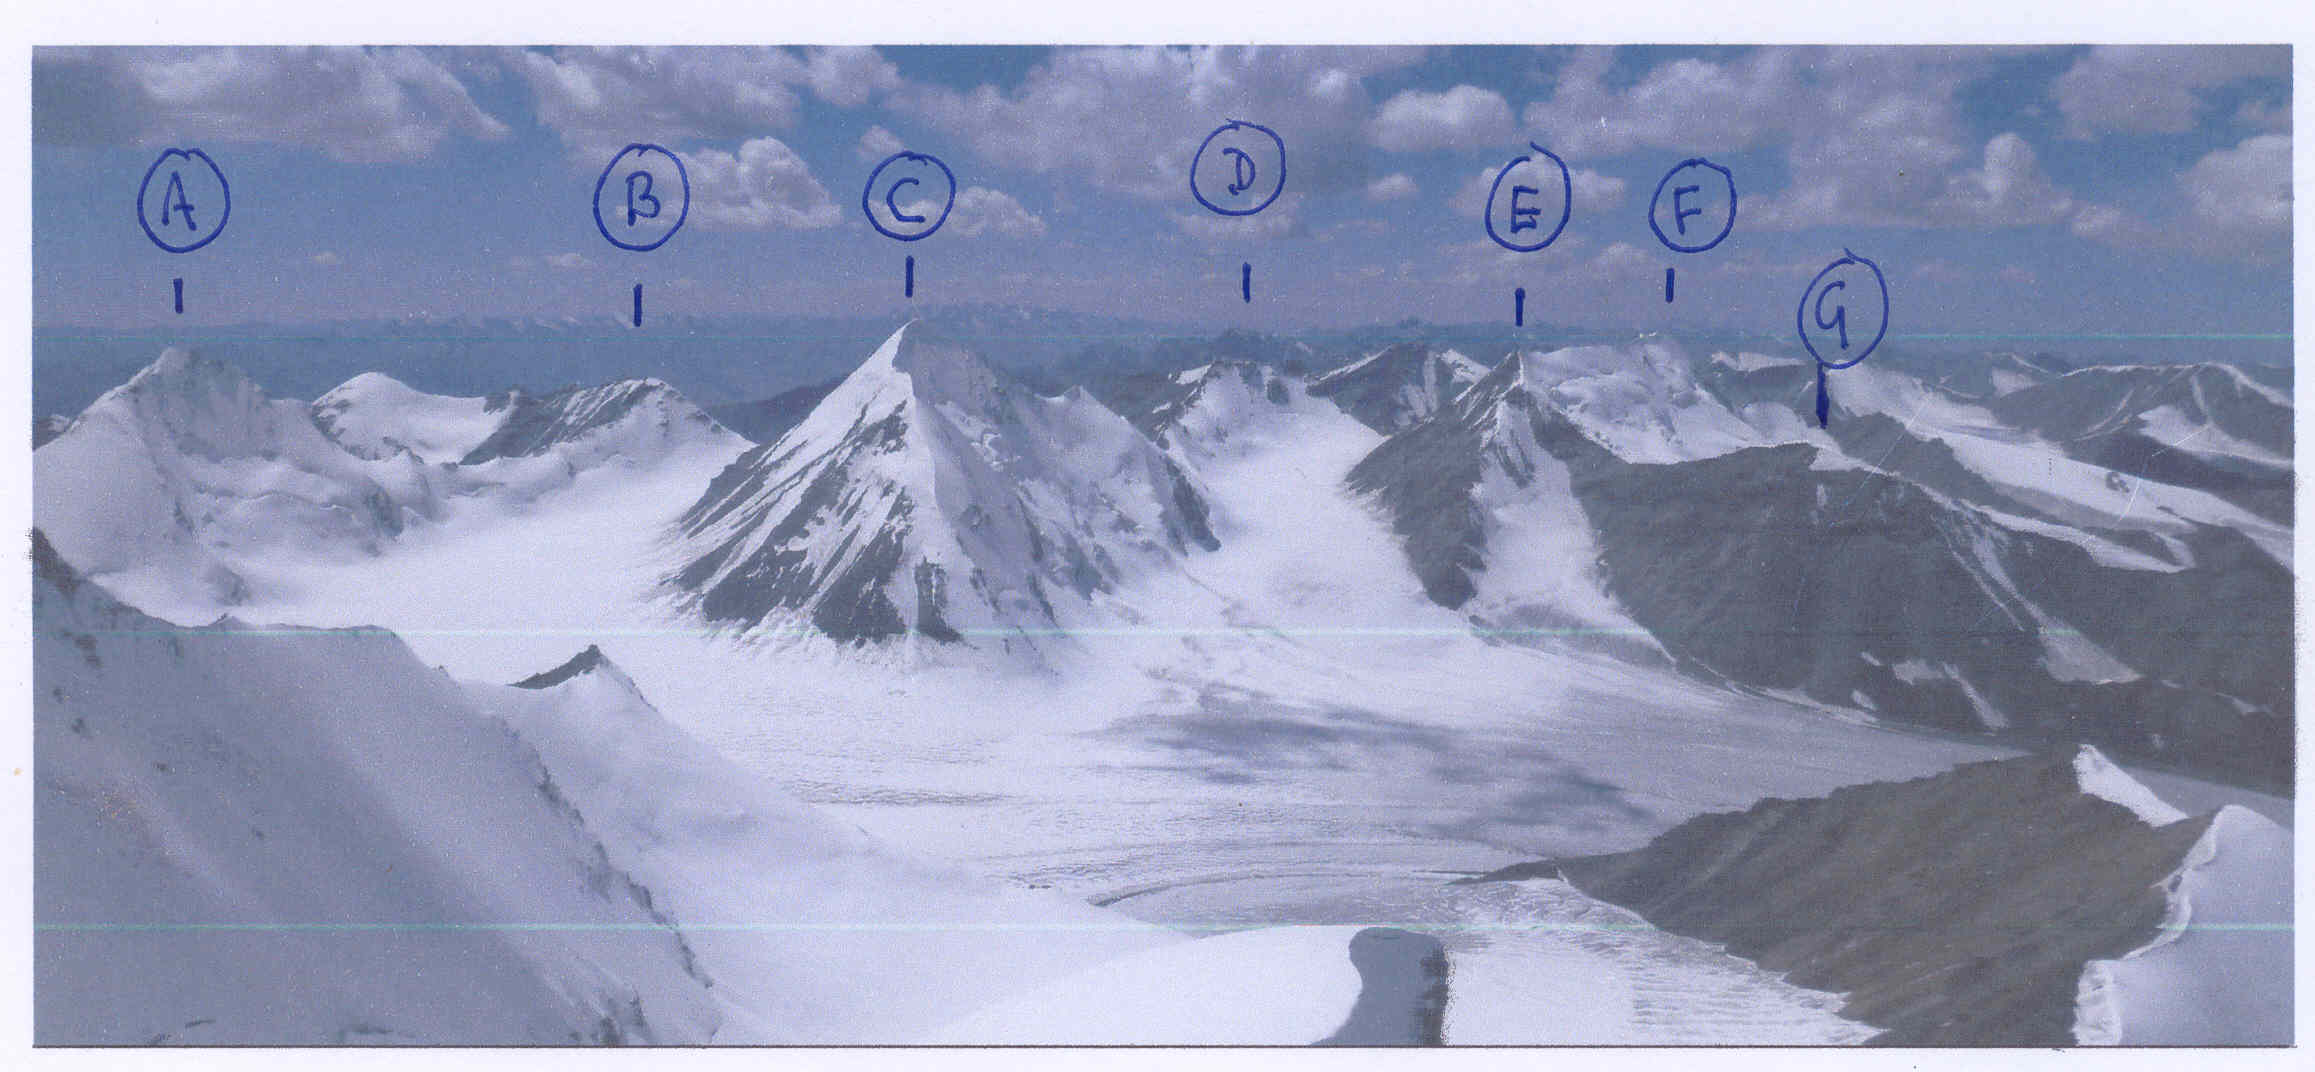 Looking west across the upper Dzhirnagaktu Glacier from Rock Horse. (A) Uighur (4,979m). (B) Krakow (4,841m). (C) Nochnoi Motyl (Night Butterfly, 5,065m). (D) Ledenaya Stre'coza (4,892m). (E) Ak-baital–Pt. Blindness (4,970m). (F) Ak-baital (4,981m). (G) Ak-baital Vostok (4,743m). Kucyk (Pony, 4,705m) is visible in lower right foreground.